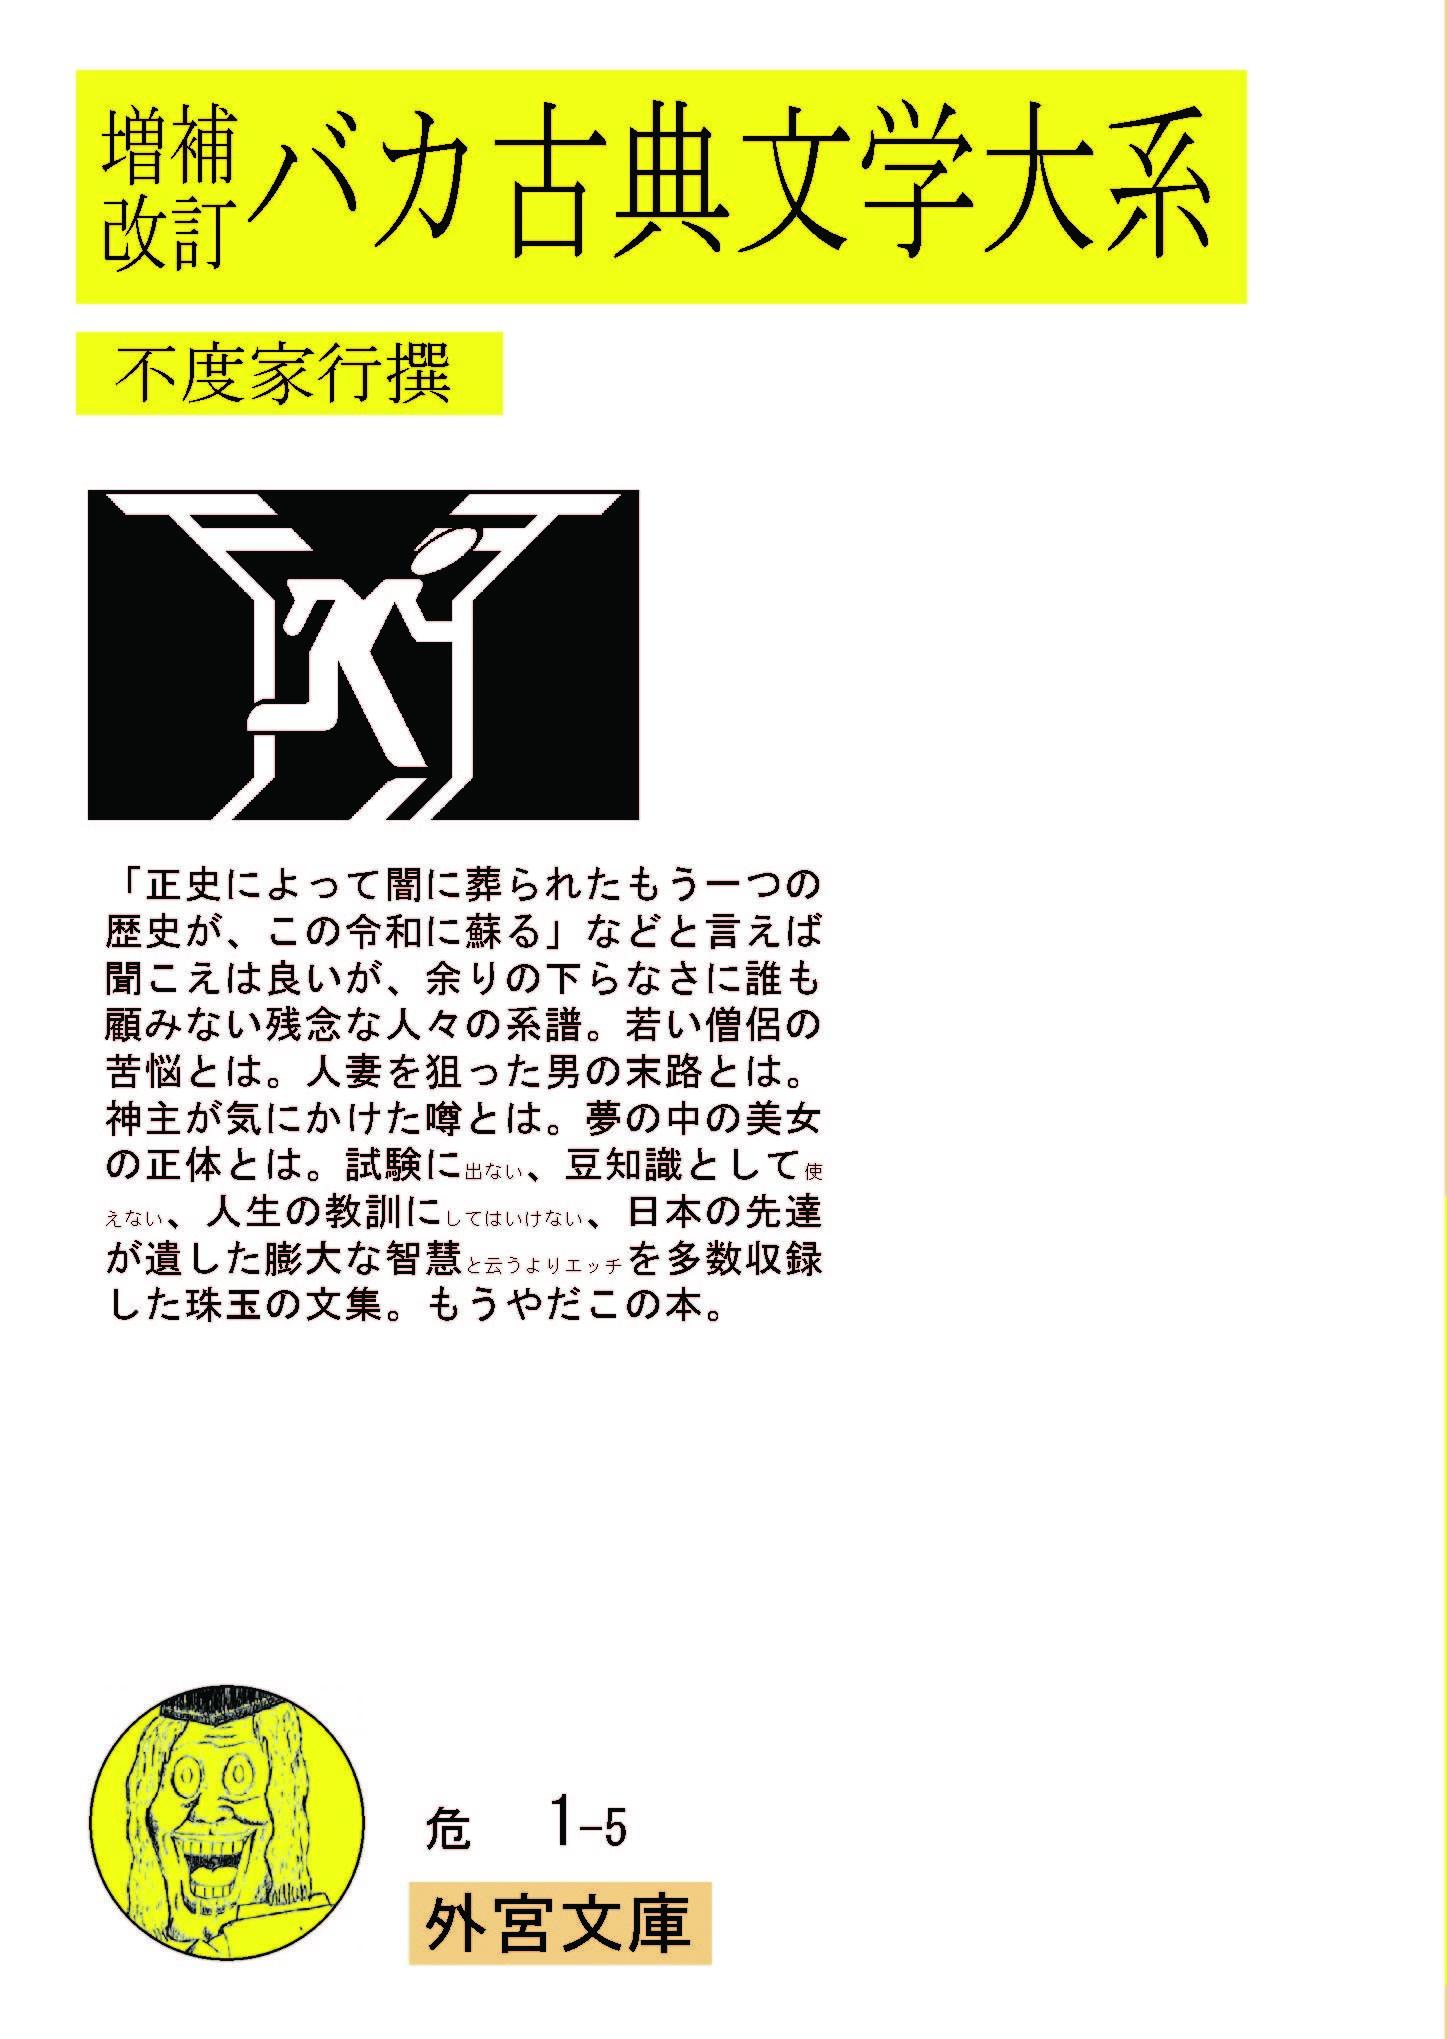 zouho_sample00.jpg